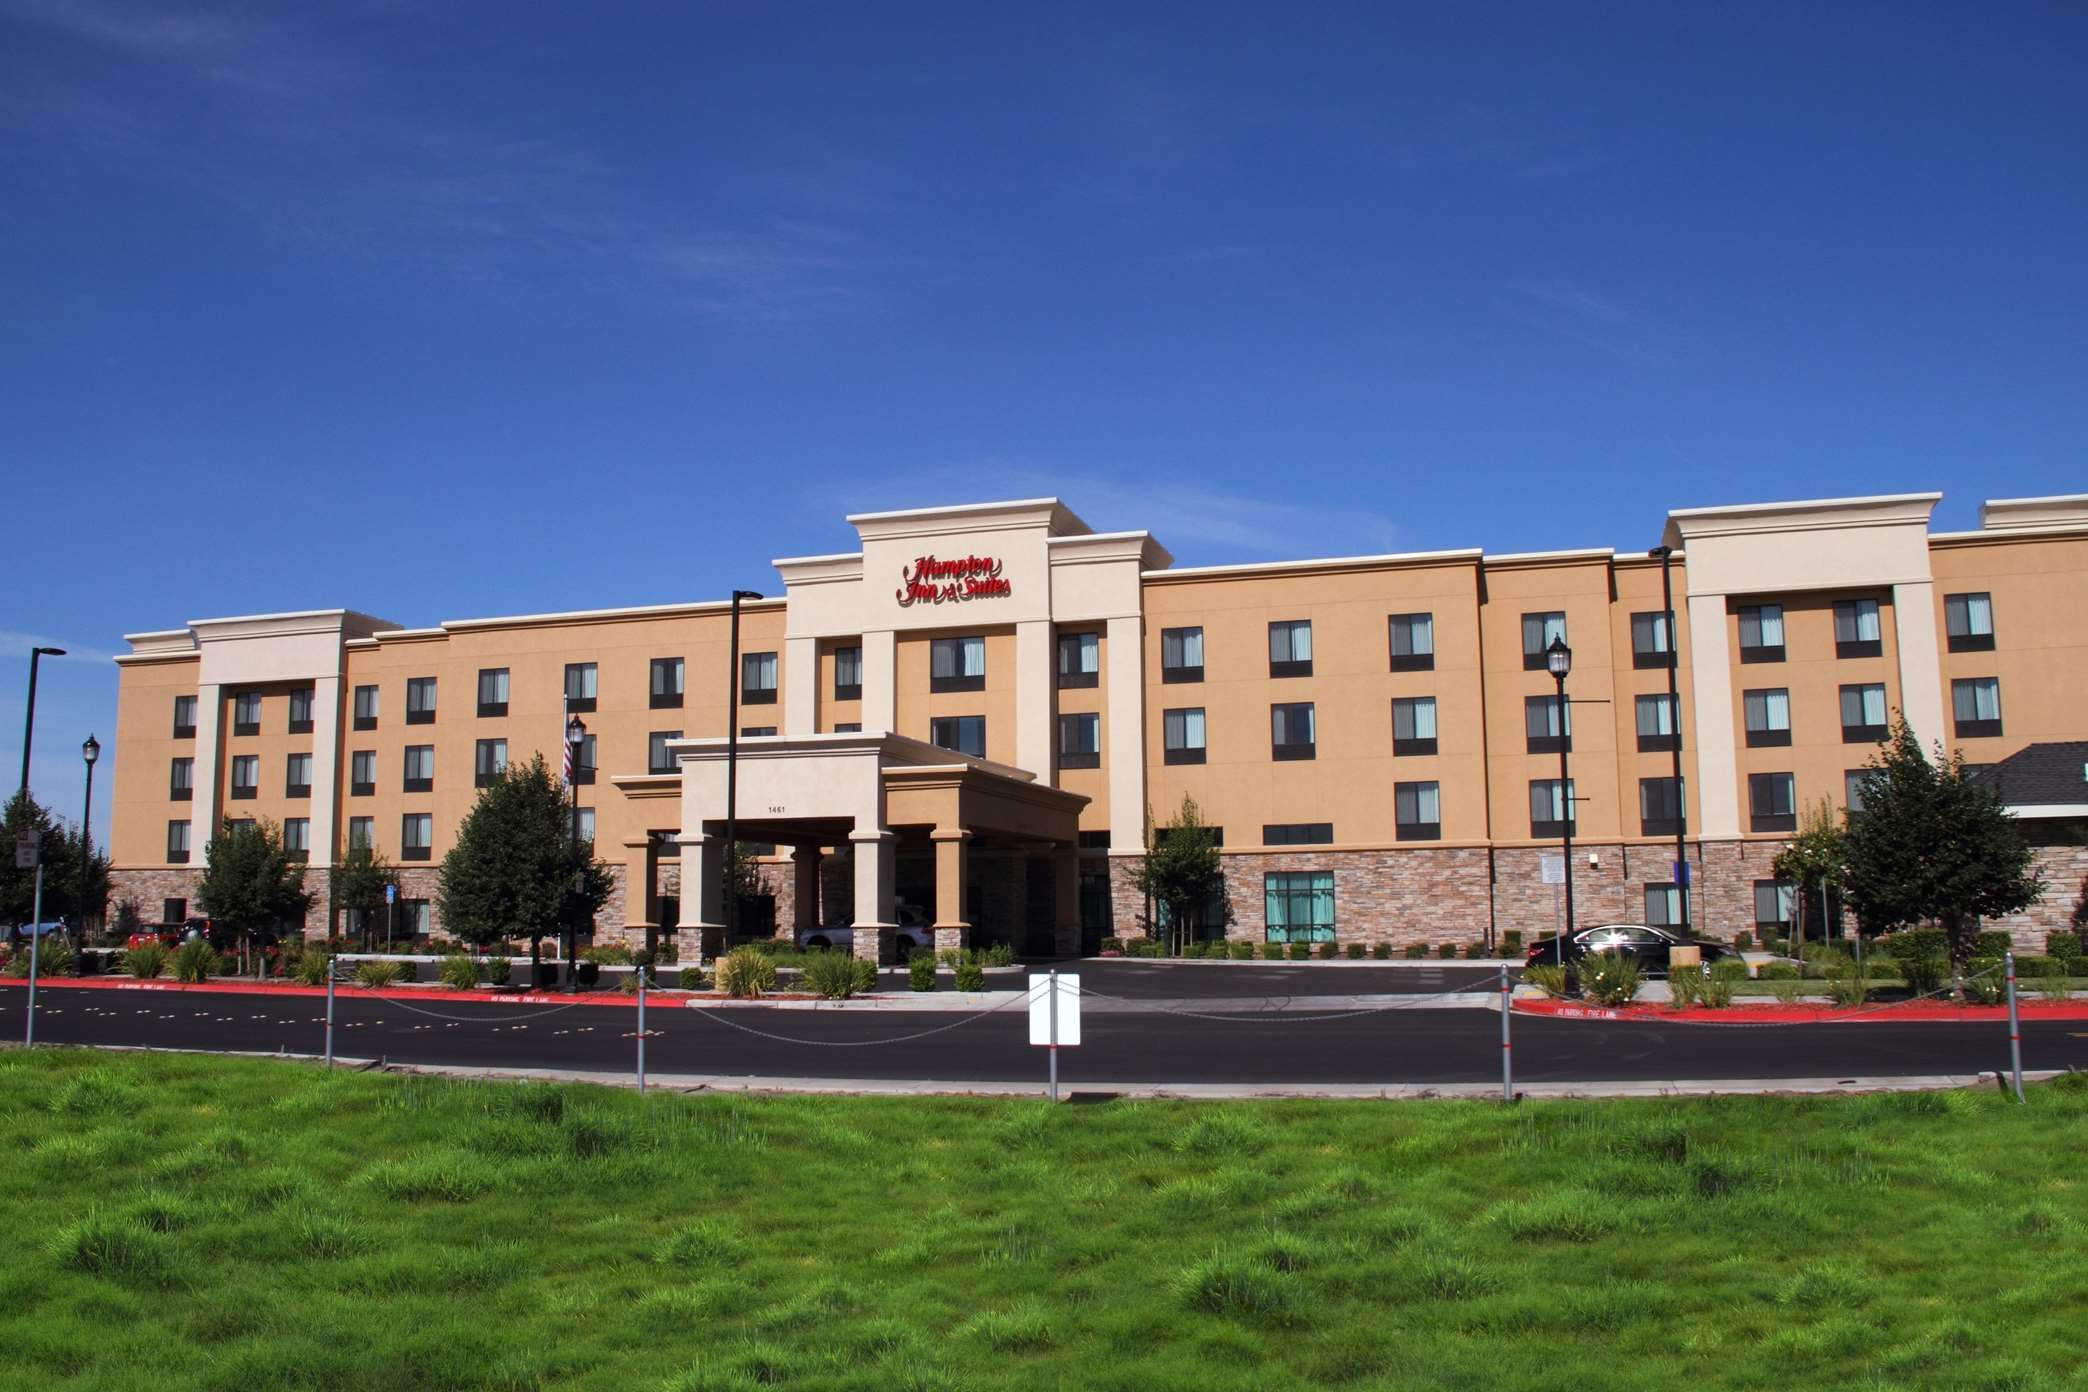 Hampton Inn & Suites Manteca image 0